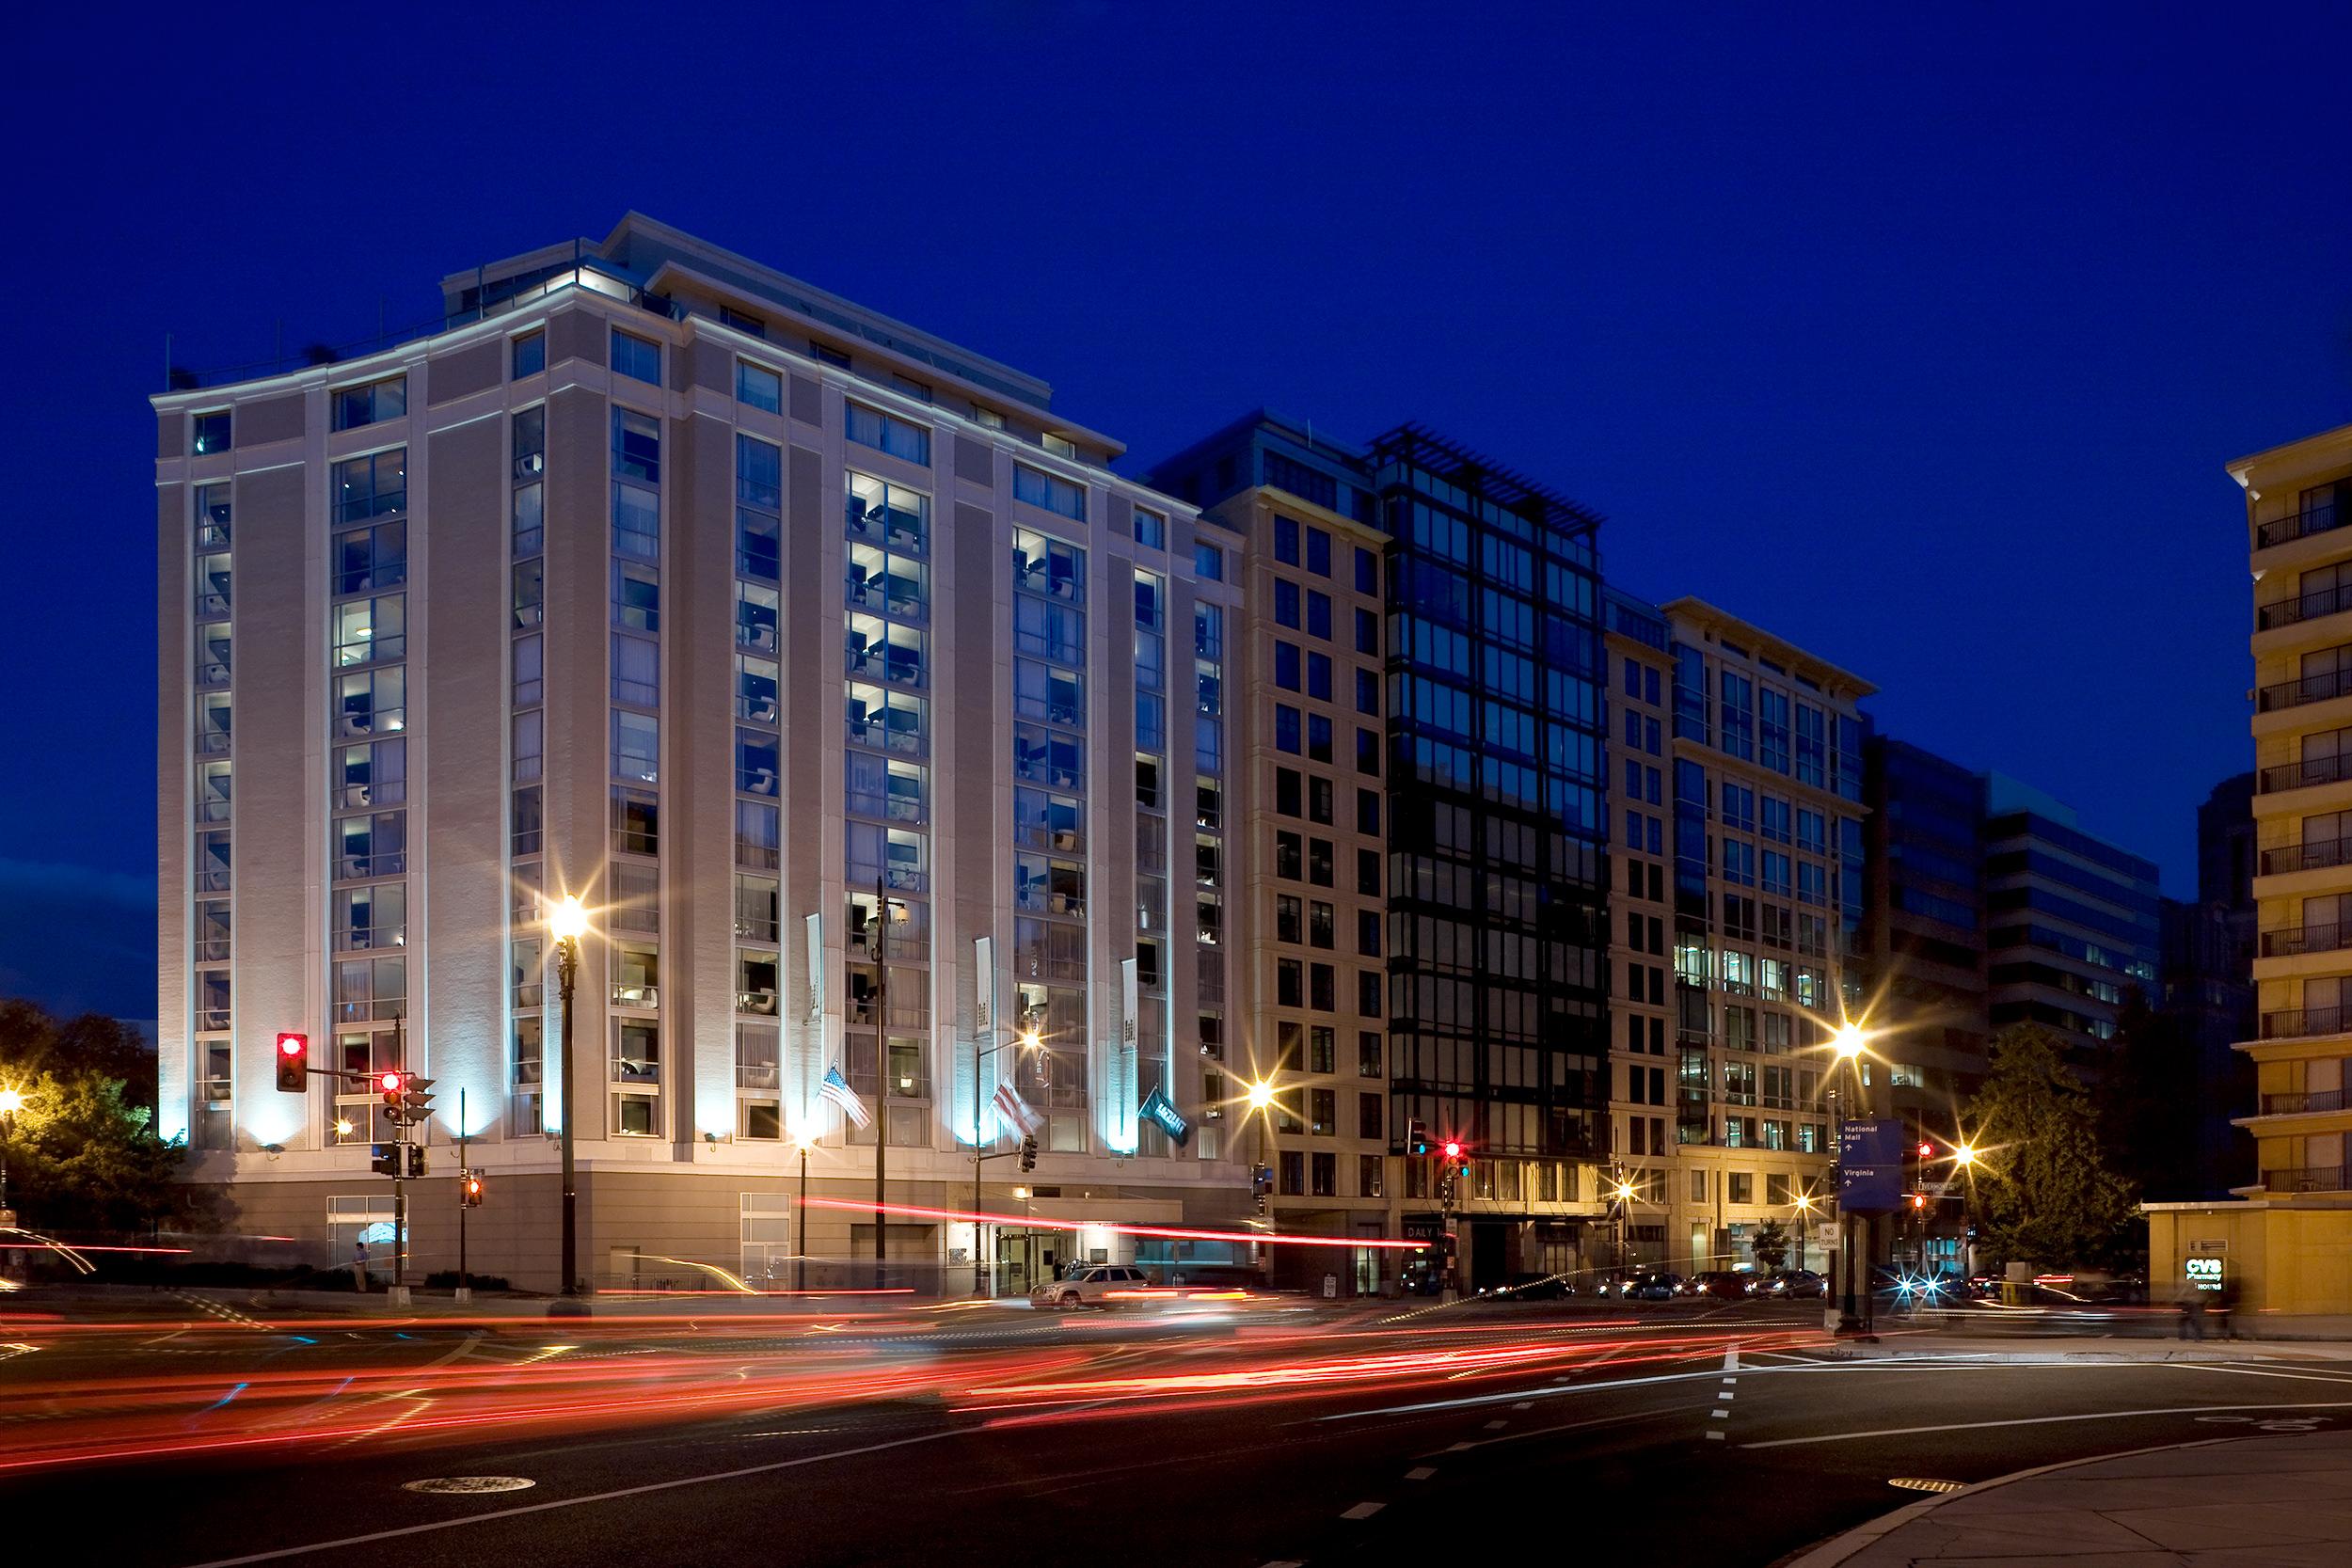 Gaszton_Hotel&Resort_Photographer_DonovanHouse_WashingtonDC_0612.jpg